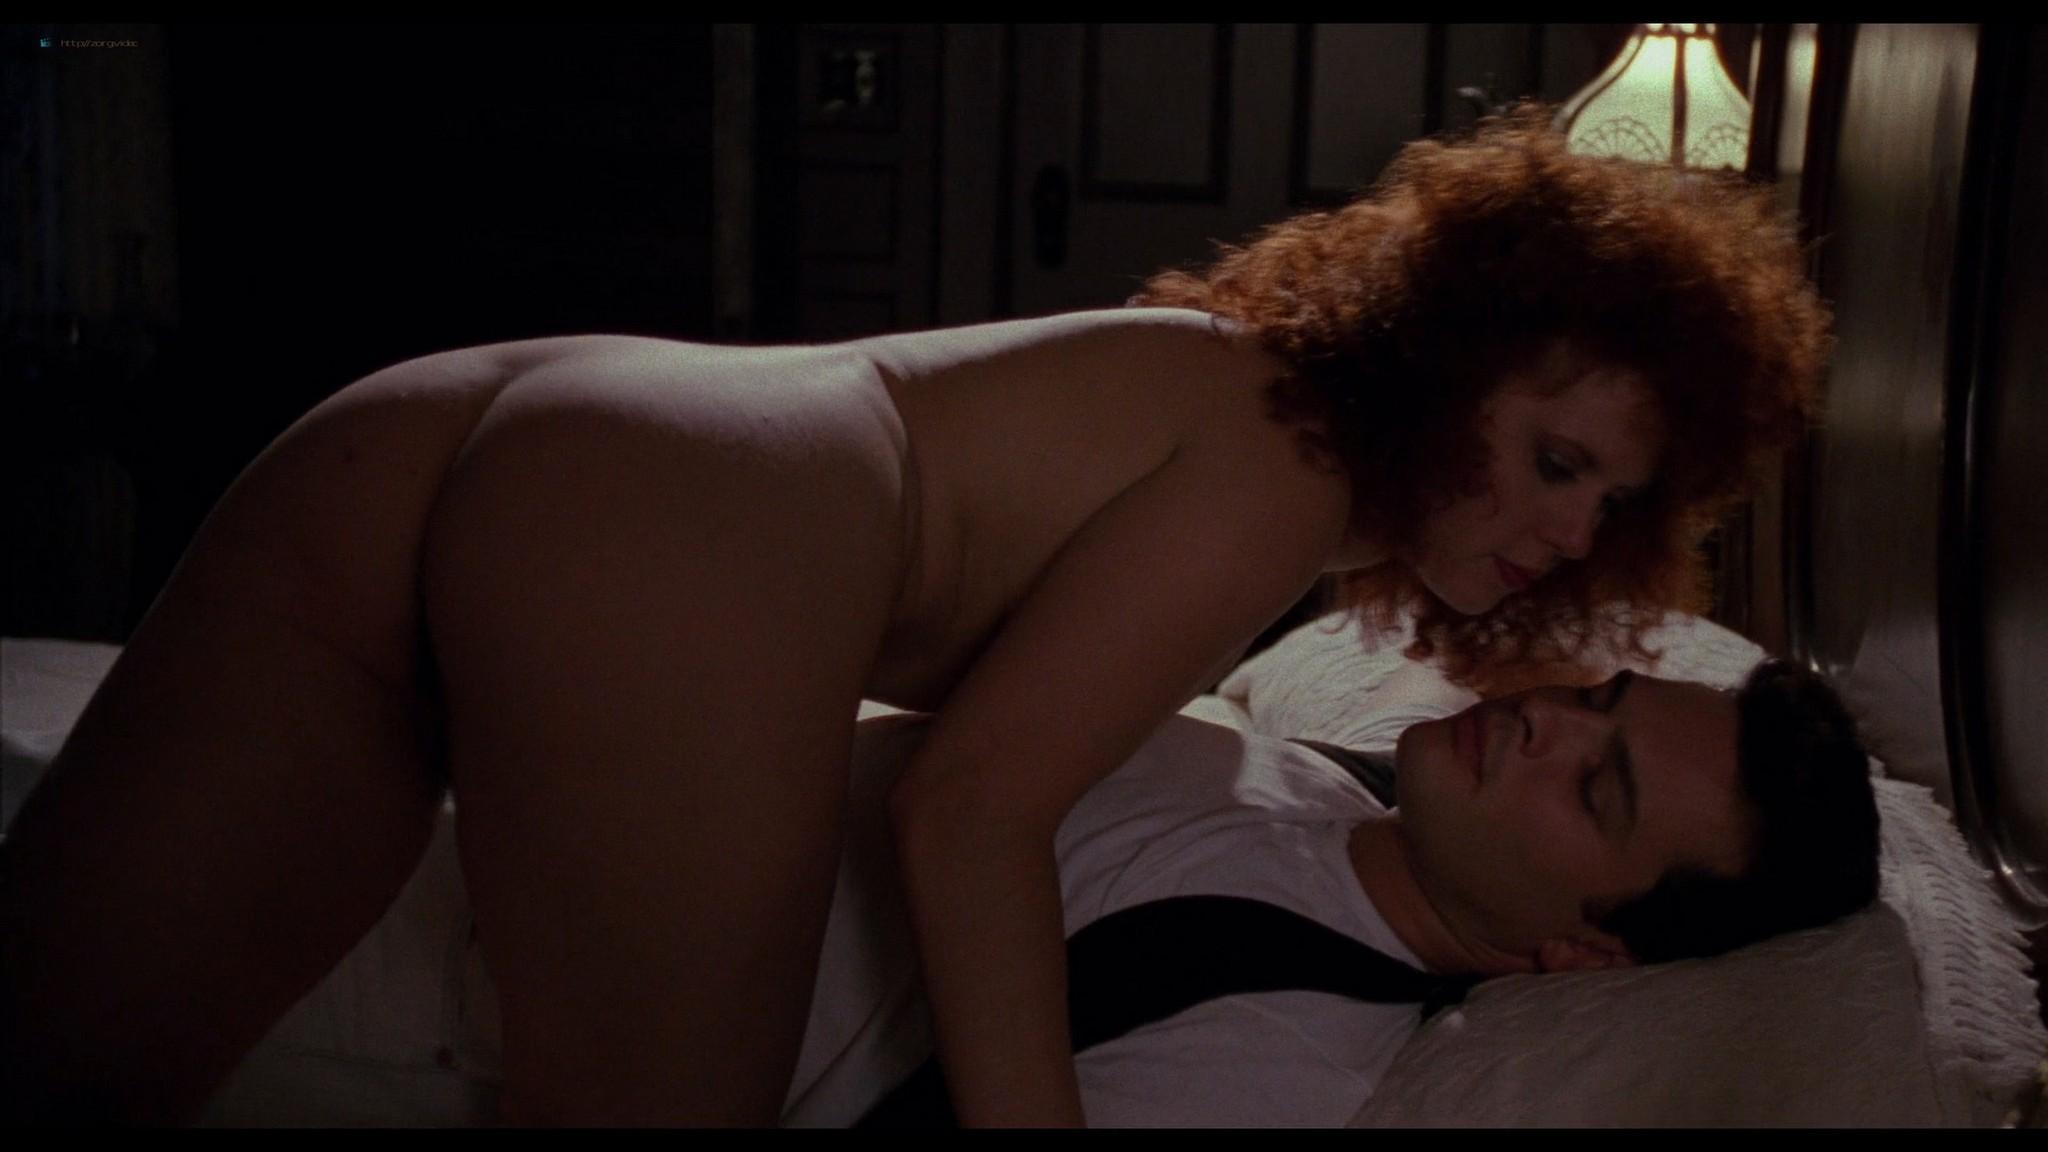 Jennifer Delora nude hot sex - Deadly Manor (1990) HD 1080p BluRay (11)